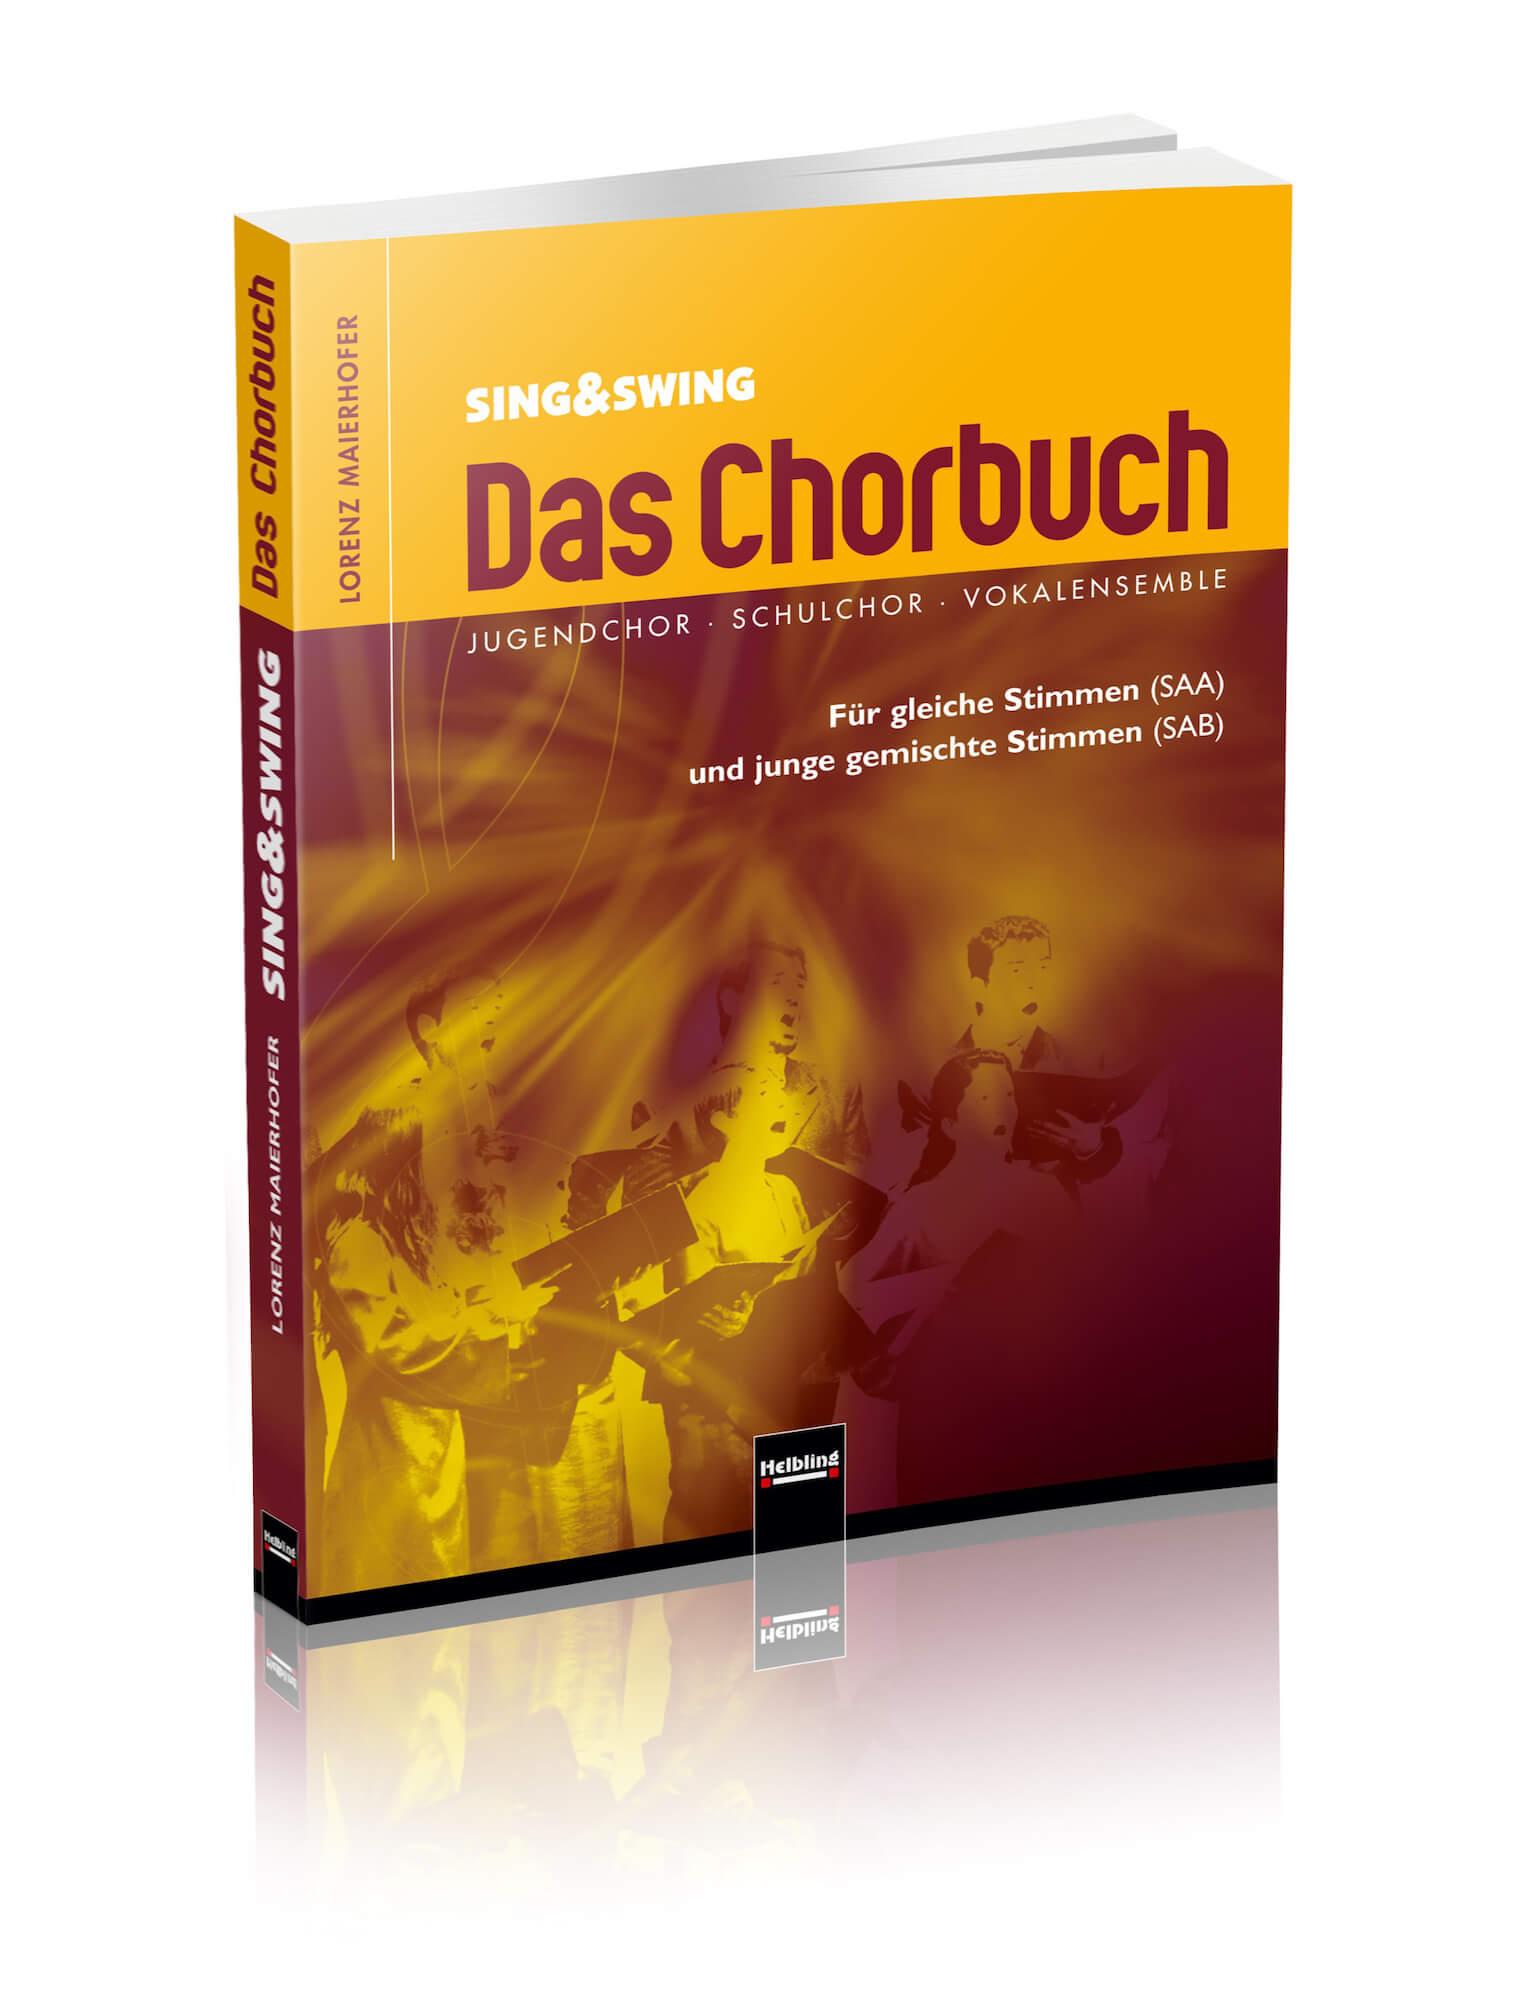 Sing+Swing_Chorbuch_mockup.jpg